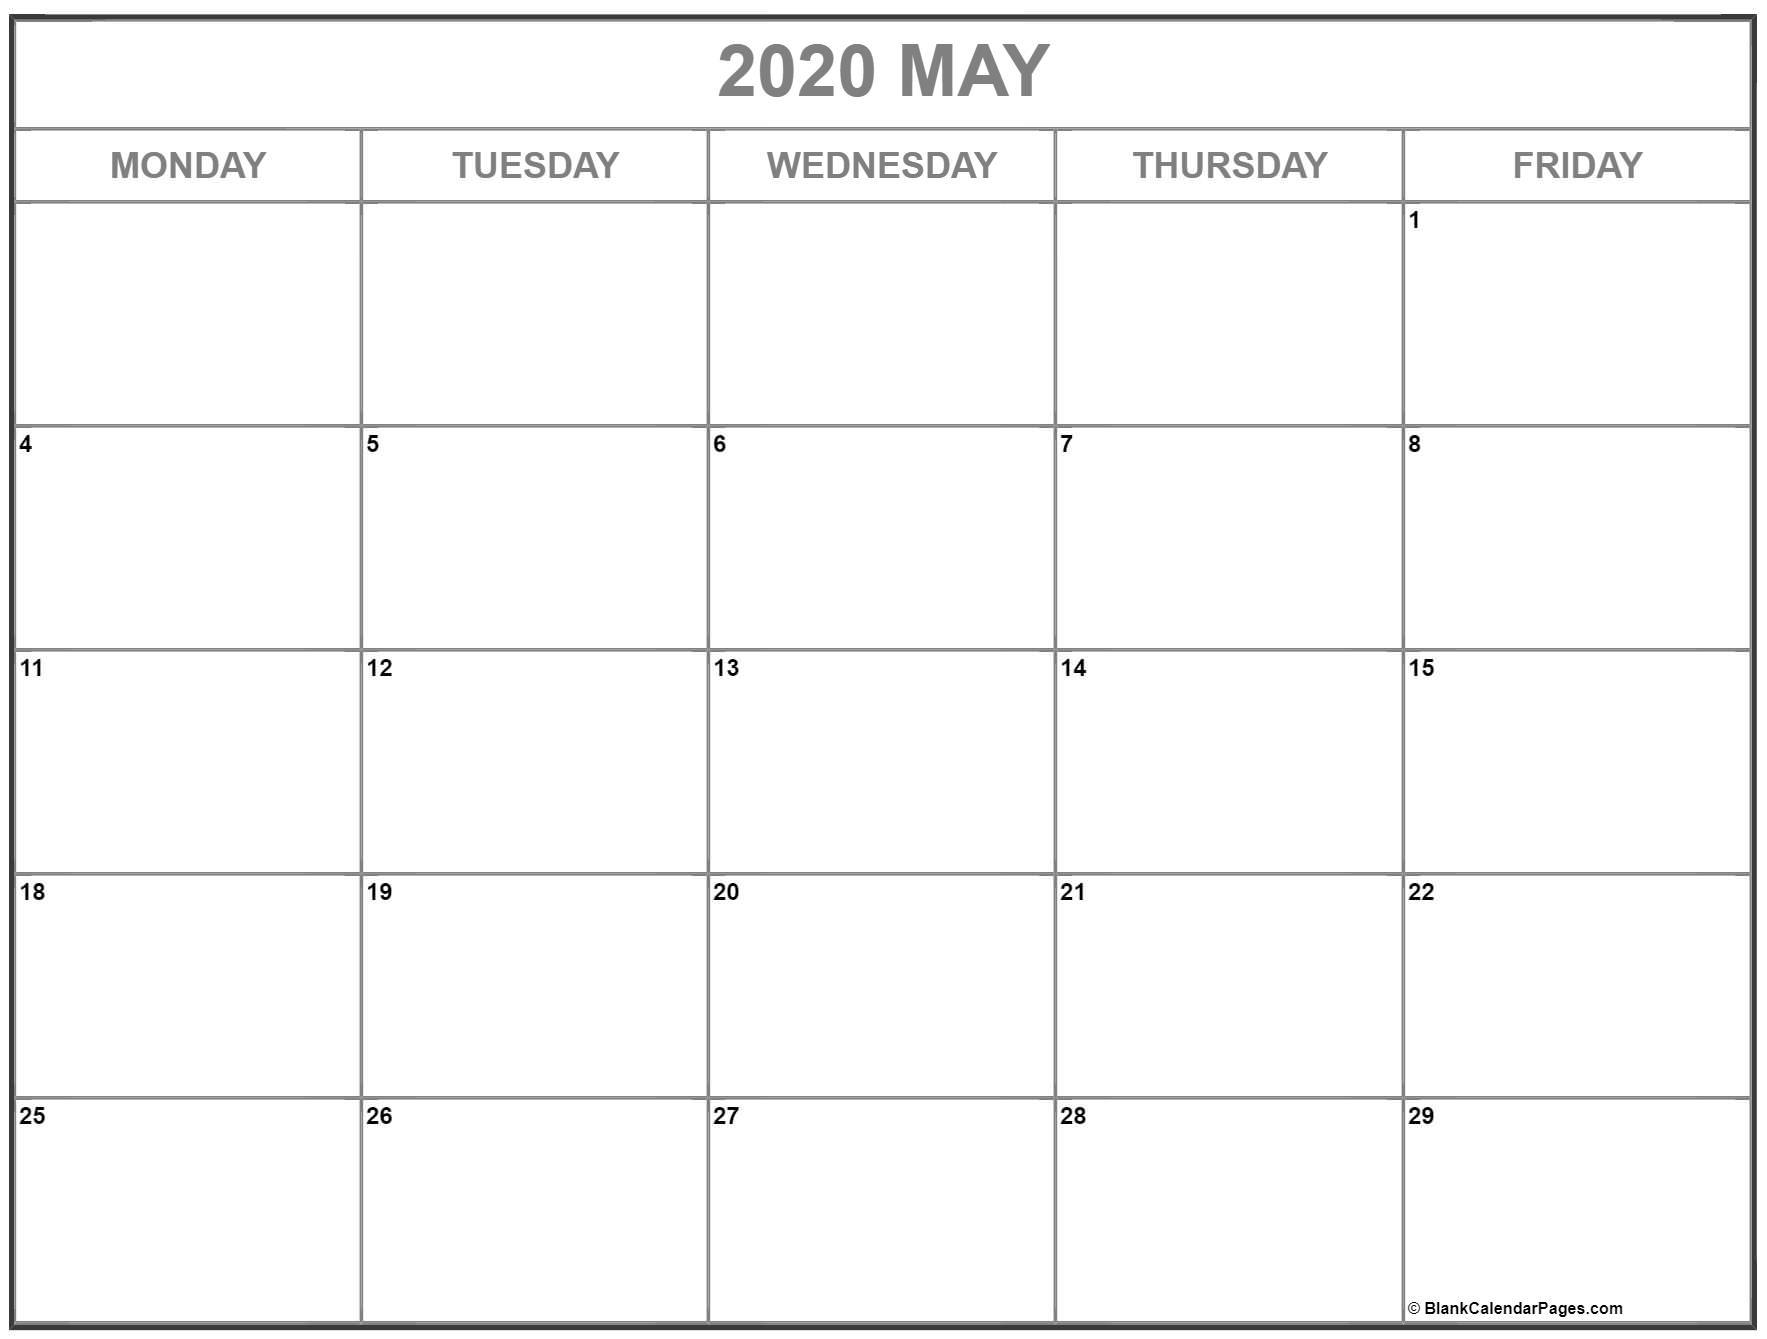 May 2020 Monday Calendar | Monday To Sunday for Monday To Friday Calendar